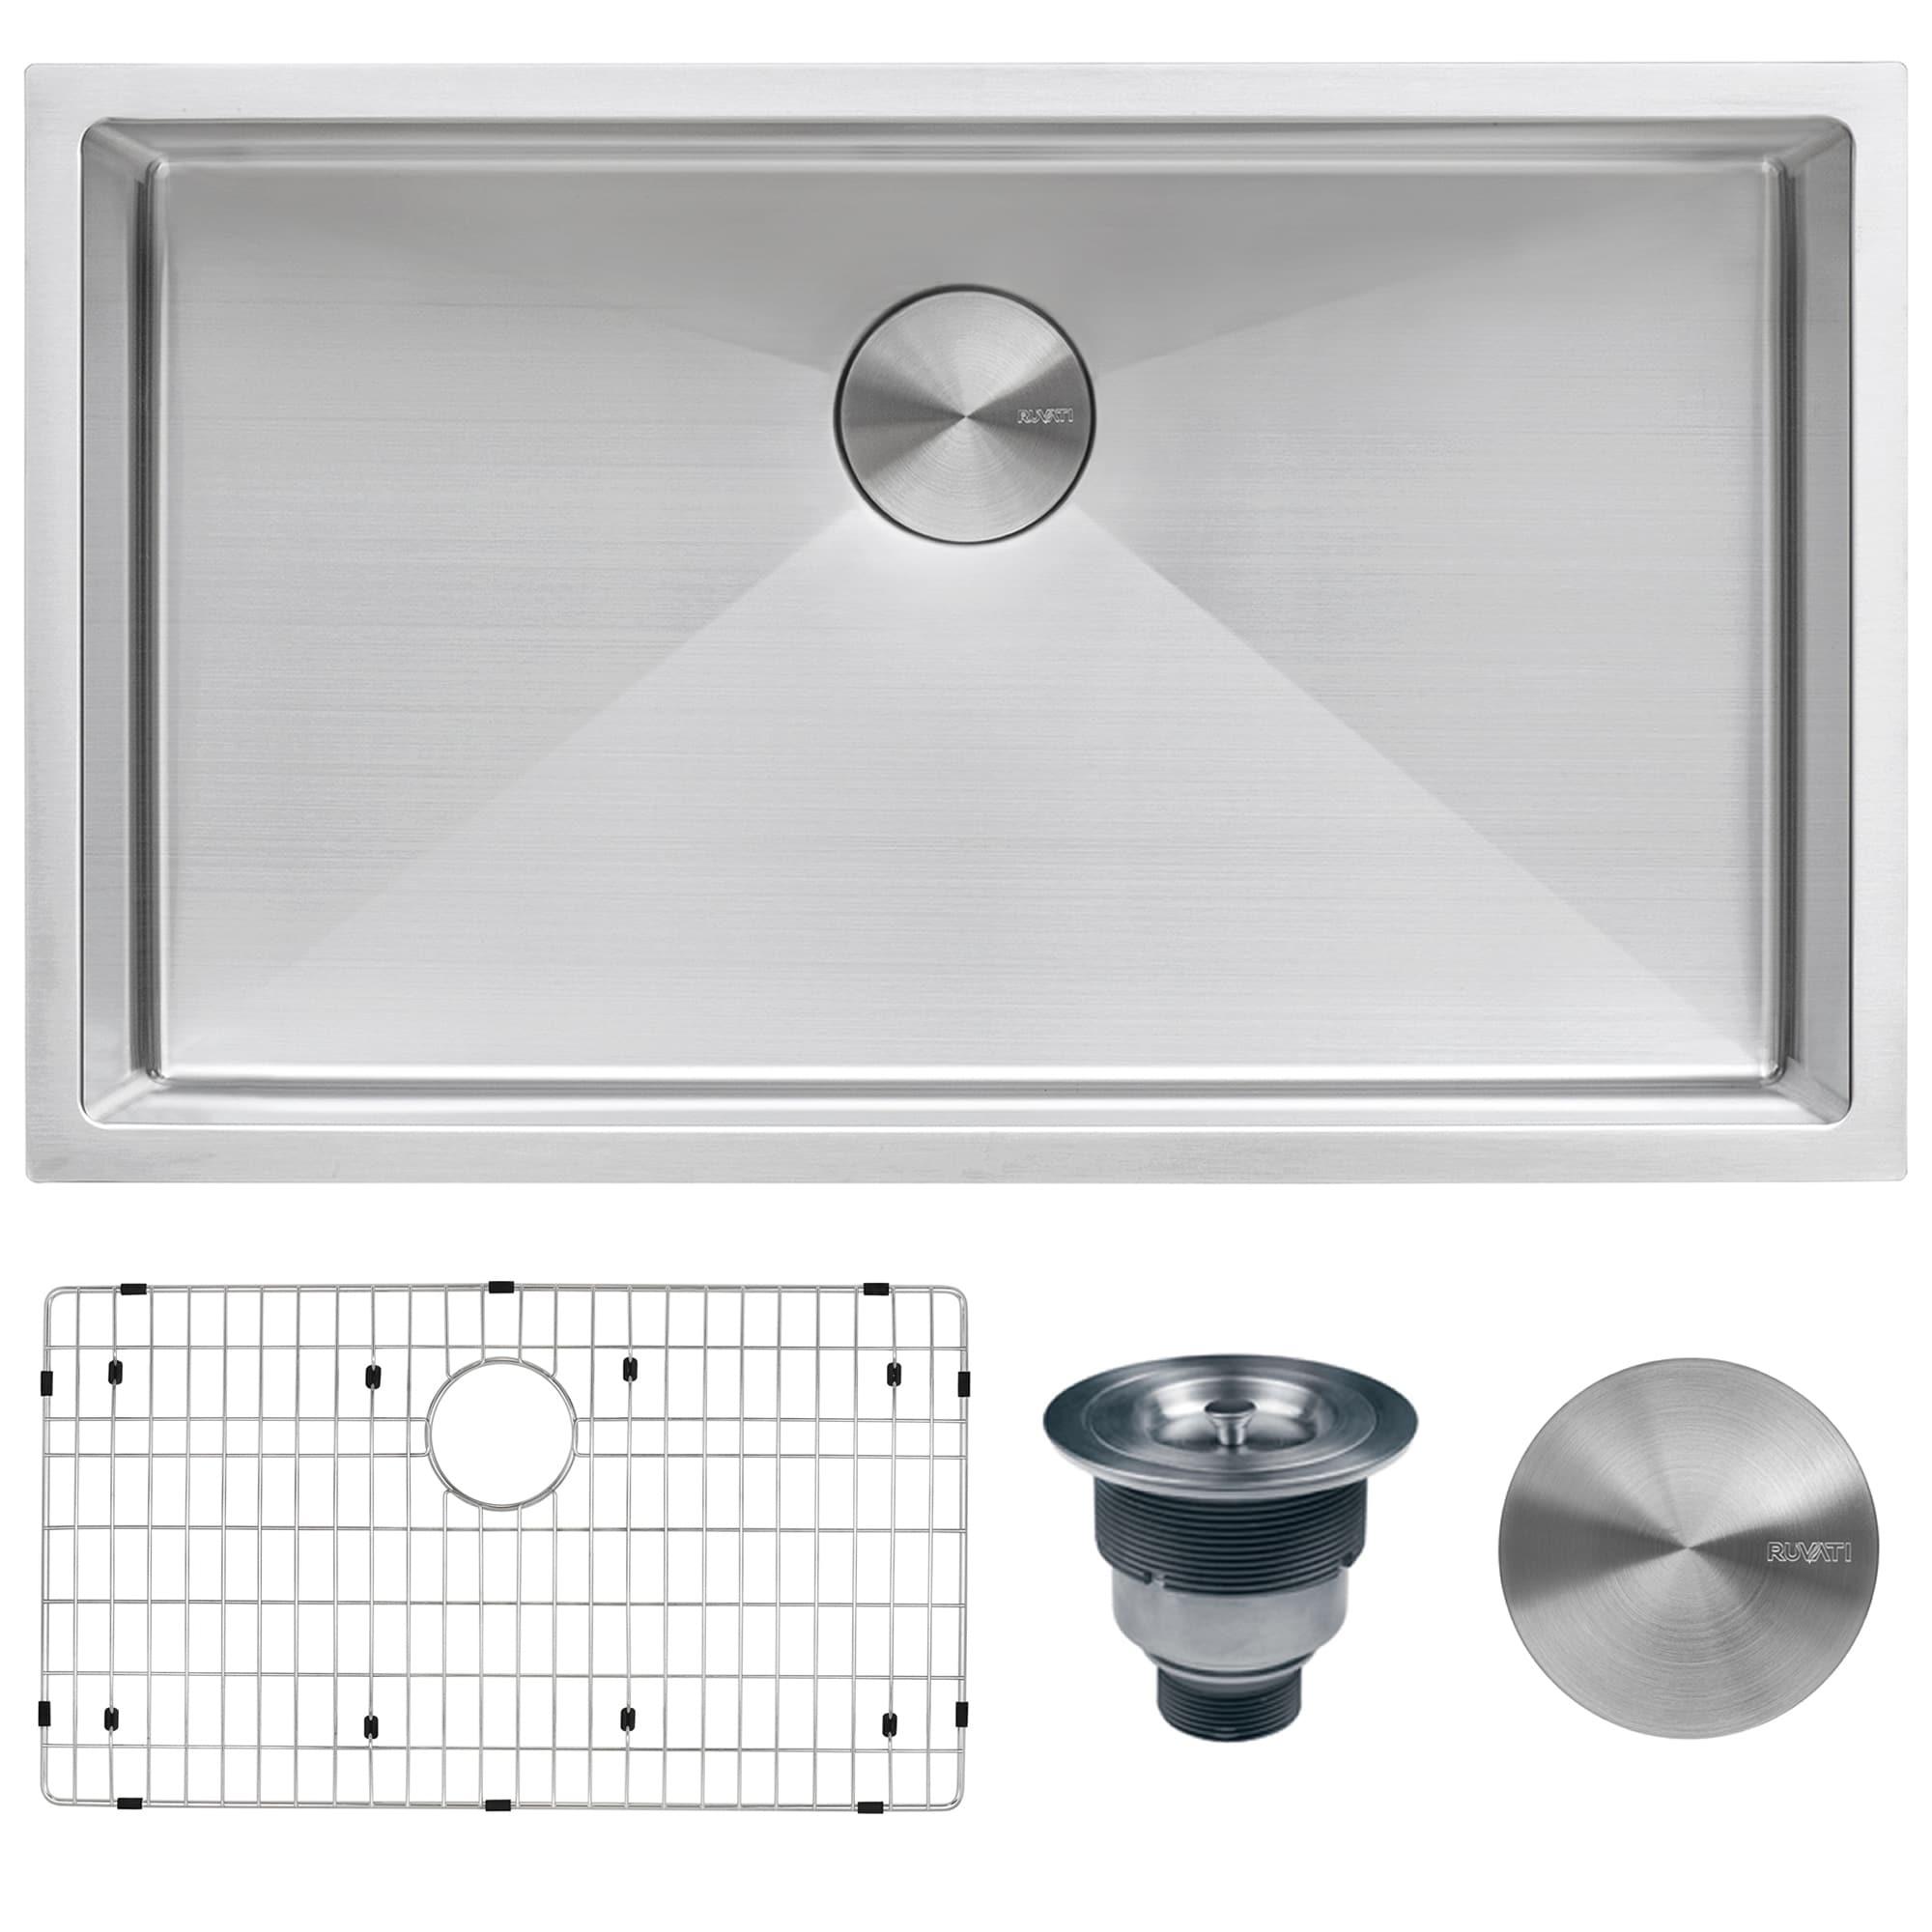 Ruvati 32-inch Undermount 16 Gauge Tight Radius Kitchen Sink Stainless  Steel Single Bowl - RVH7400